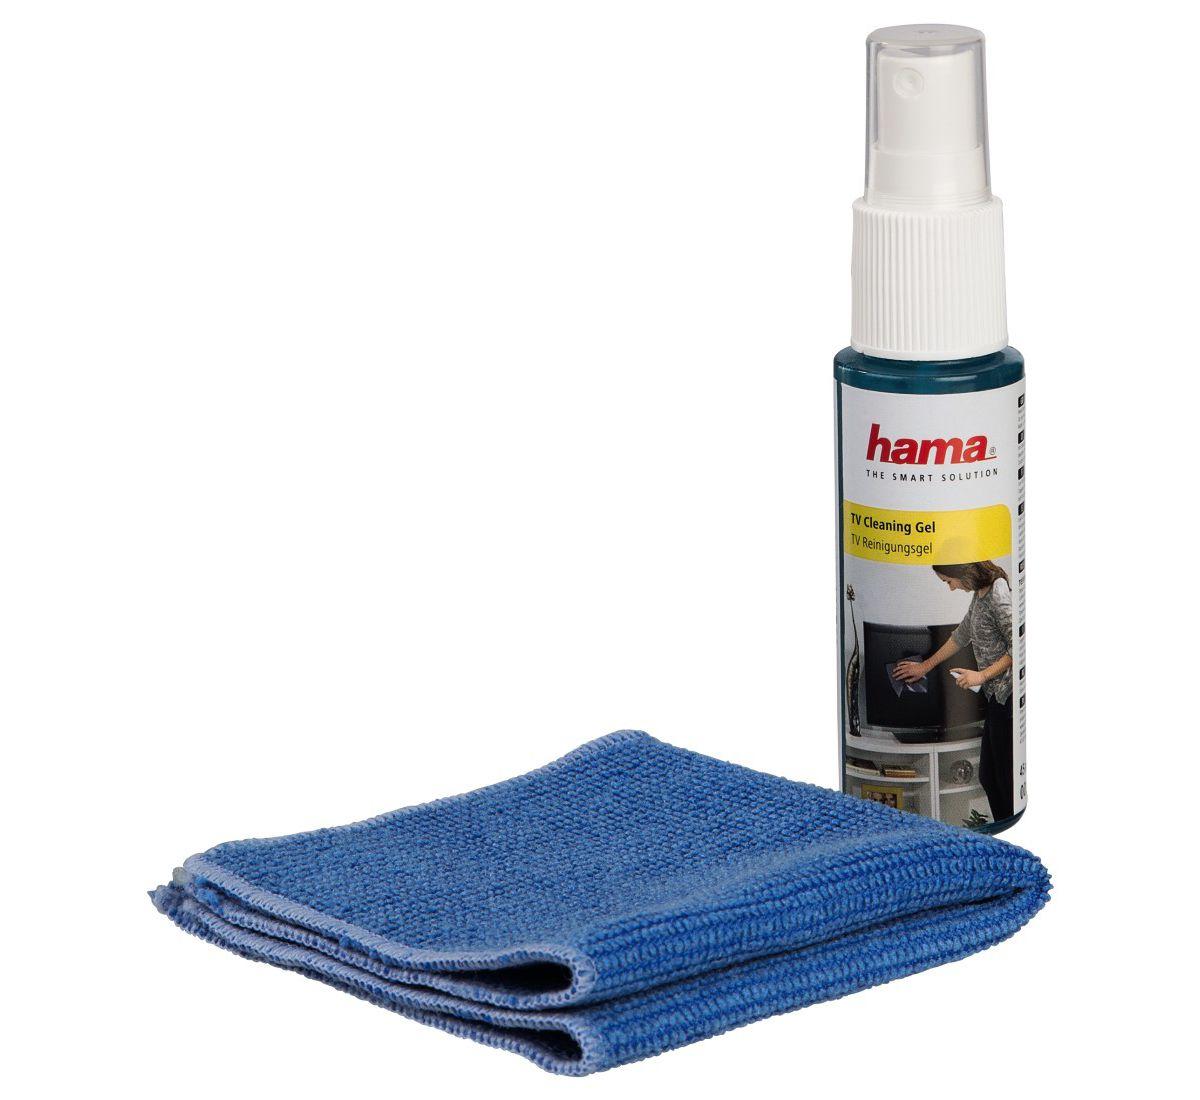 Hama TV-Reinigungsset, 45 ml, Compact